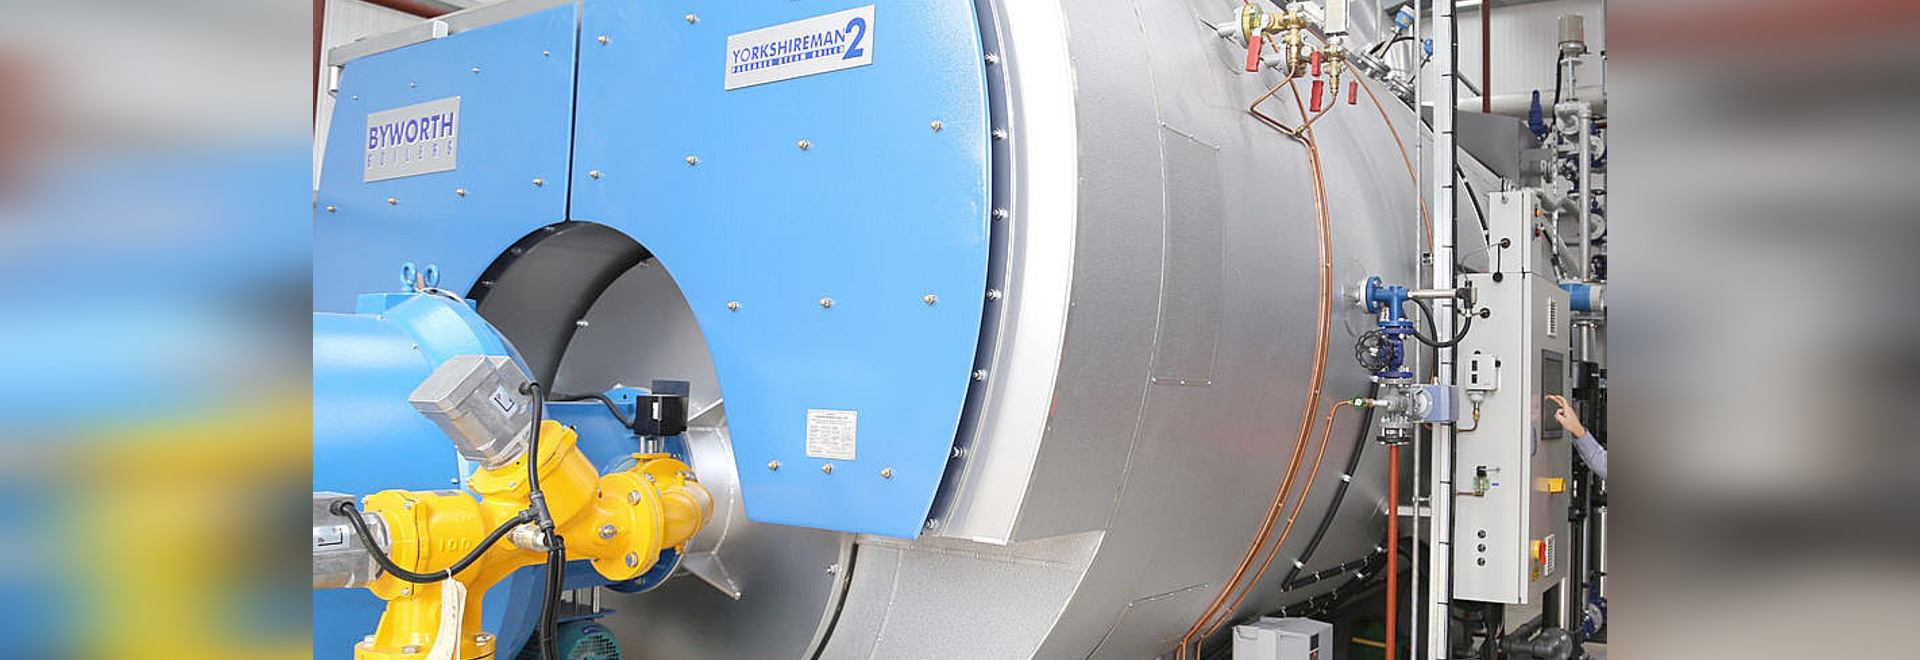 Yorkshireman 2 boiler : run process using either natural gas or ...